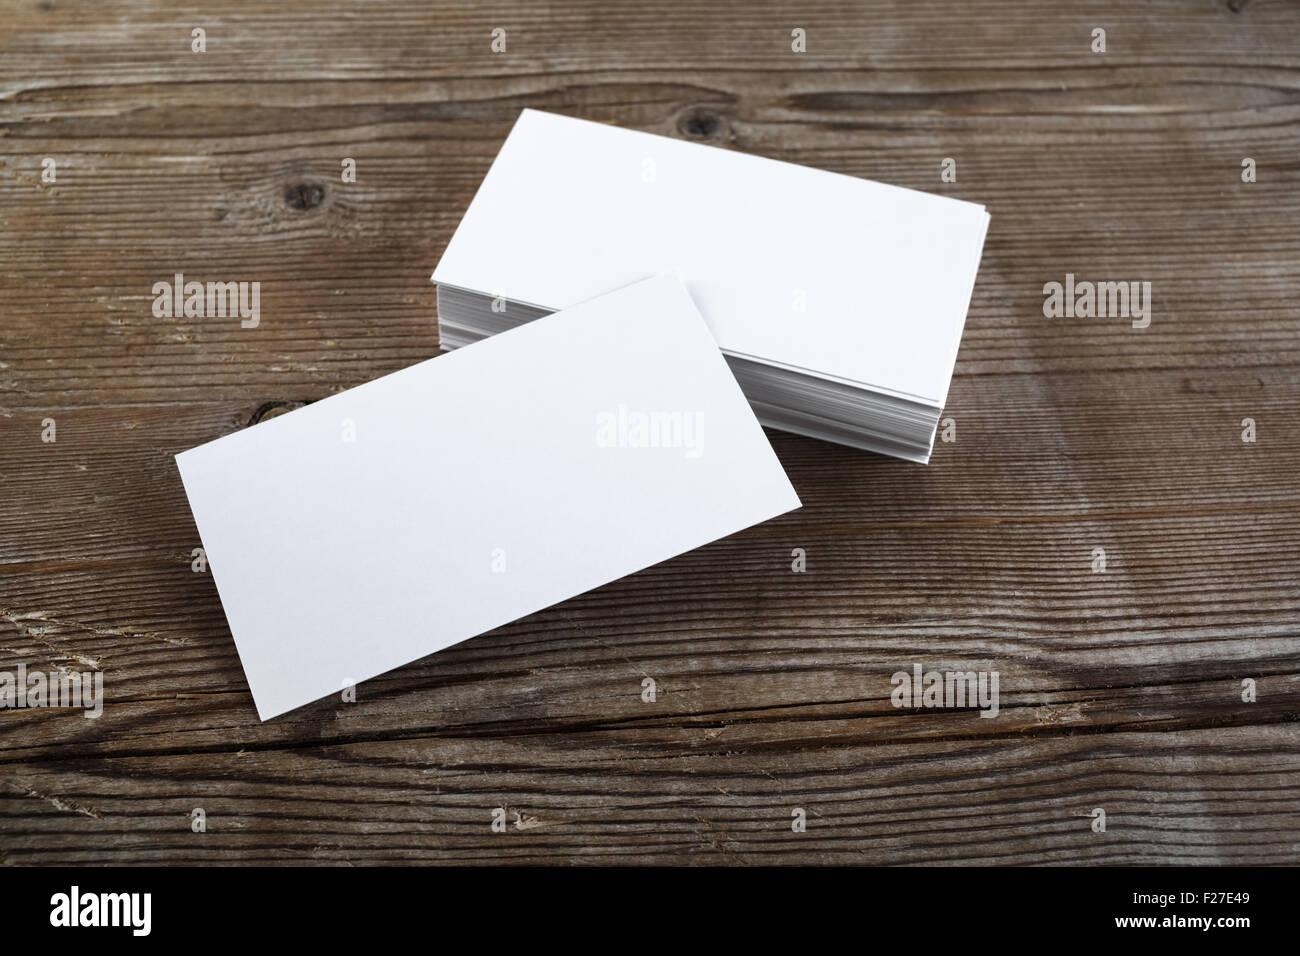 Business Card Blank Mockup Stock Photos & Business Card Blank Mockup ...